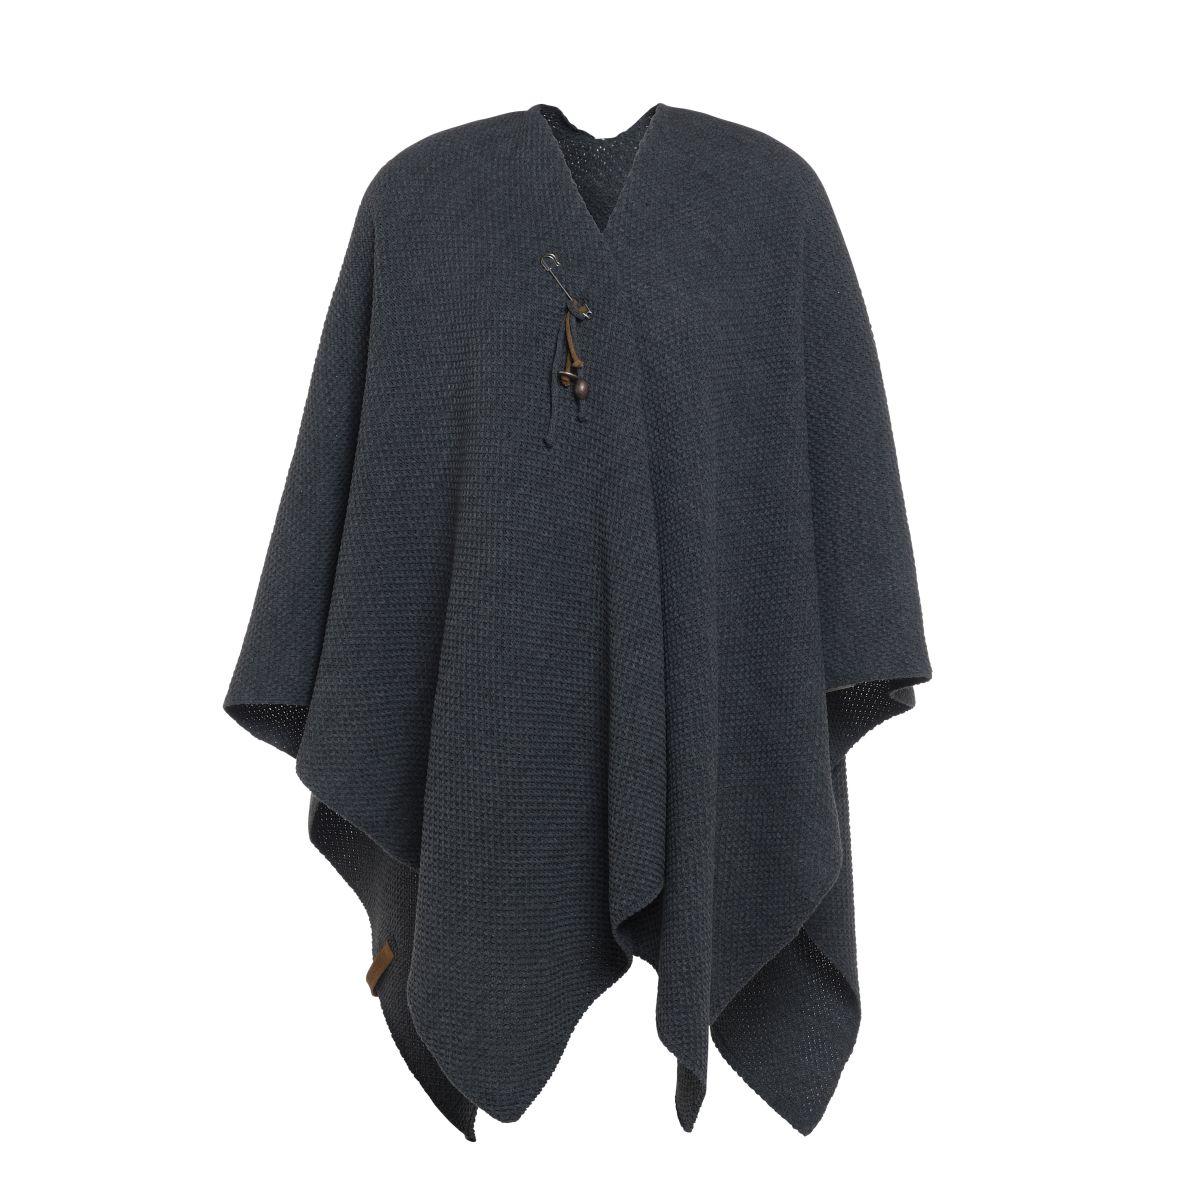 jazz shawl wrap anthracite